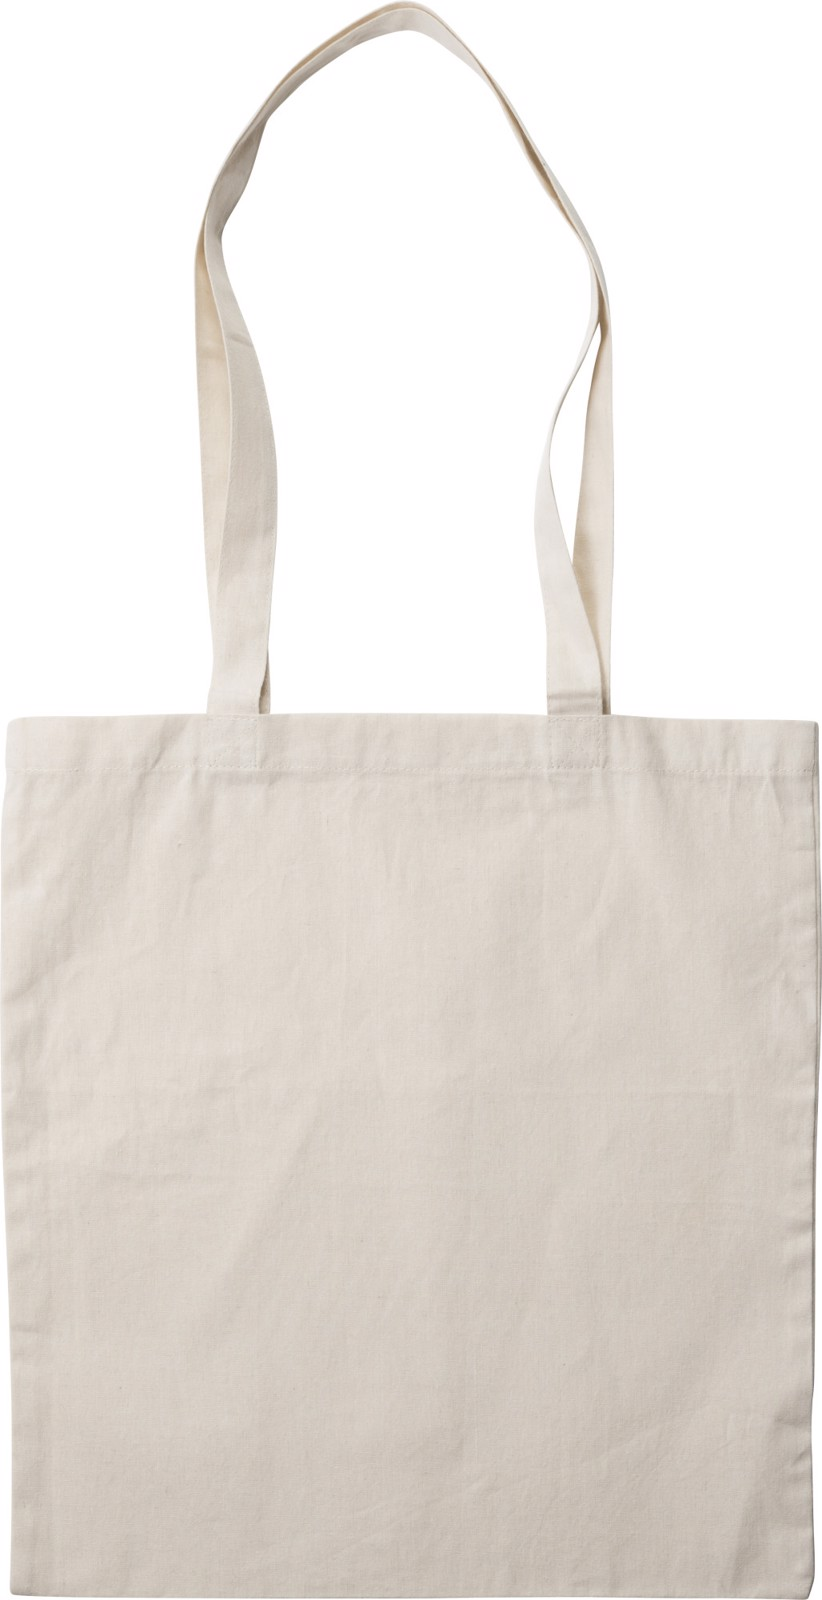 Cotton (180 gr/m²) shopping bag